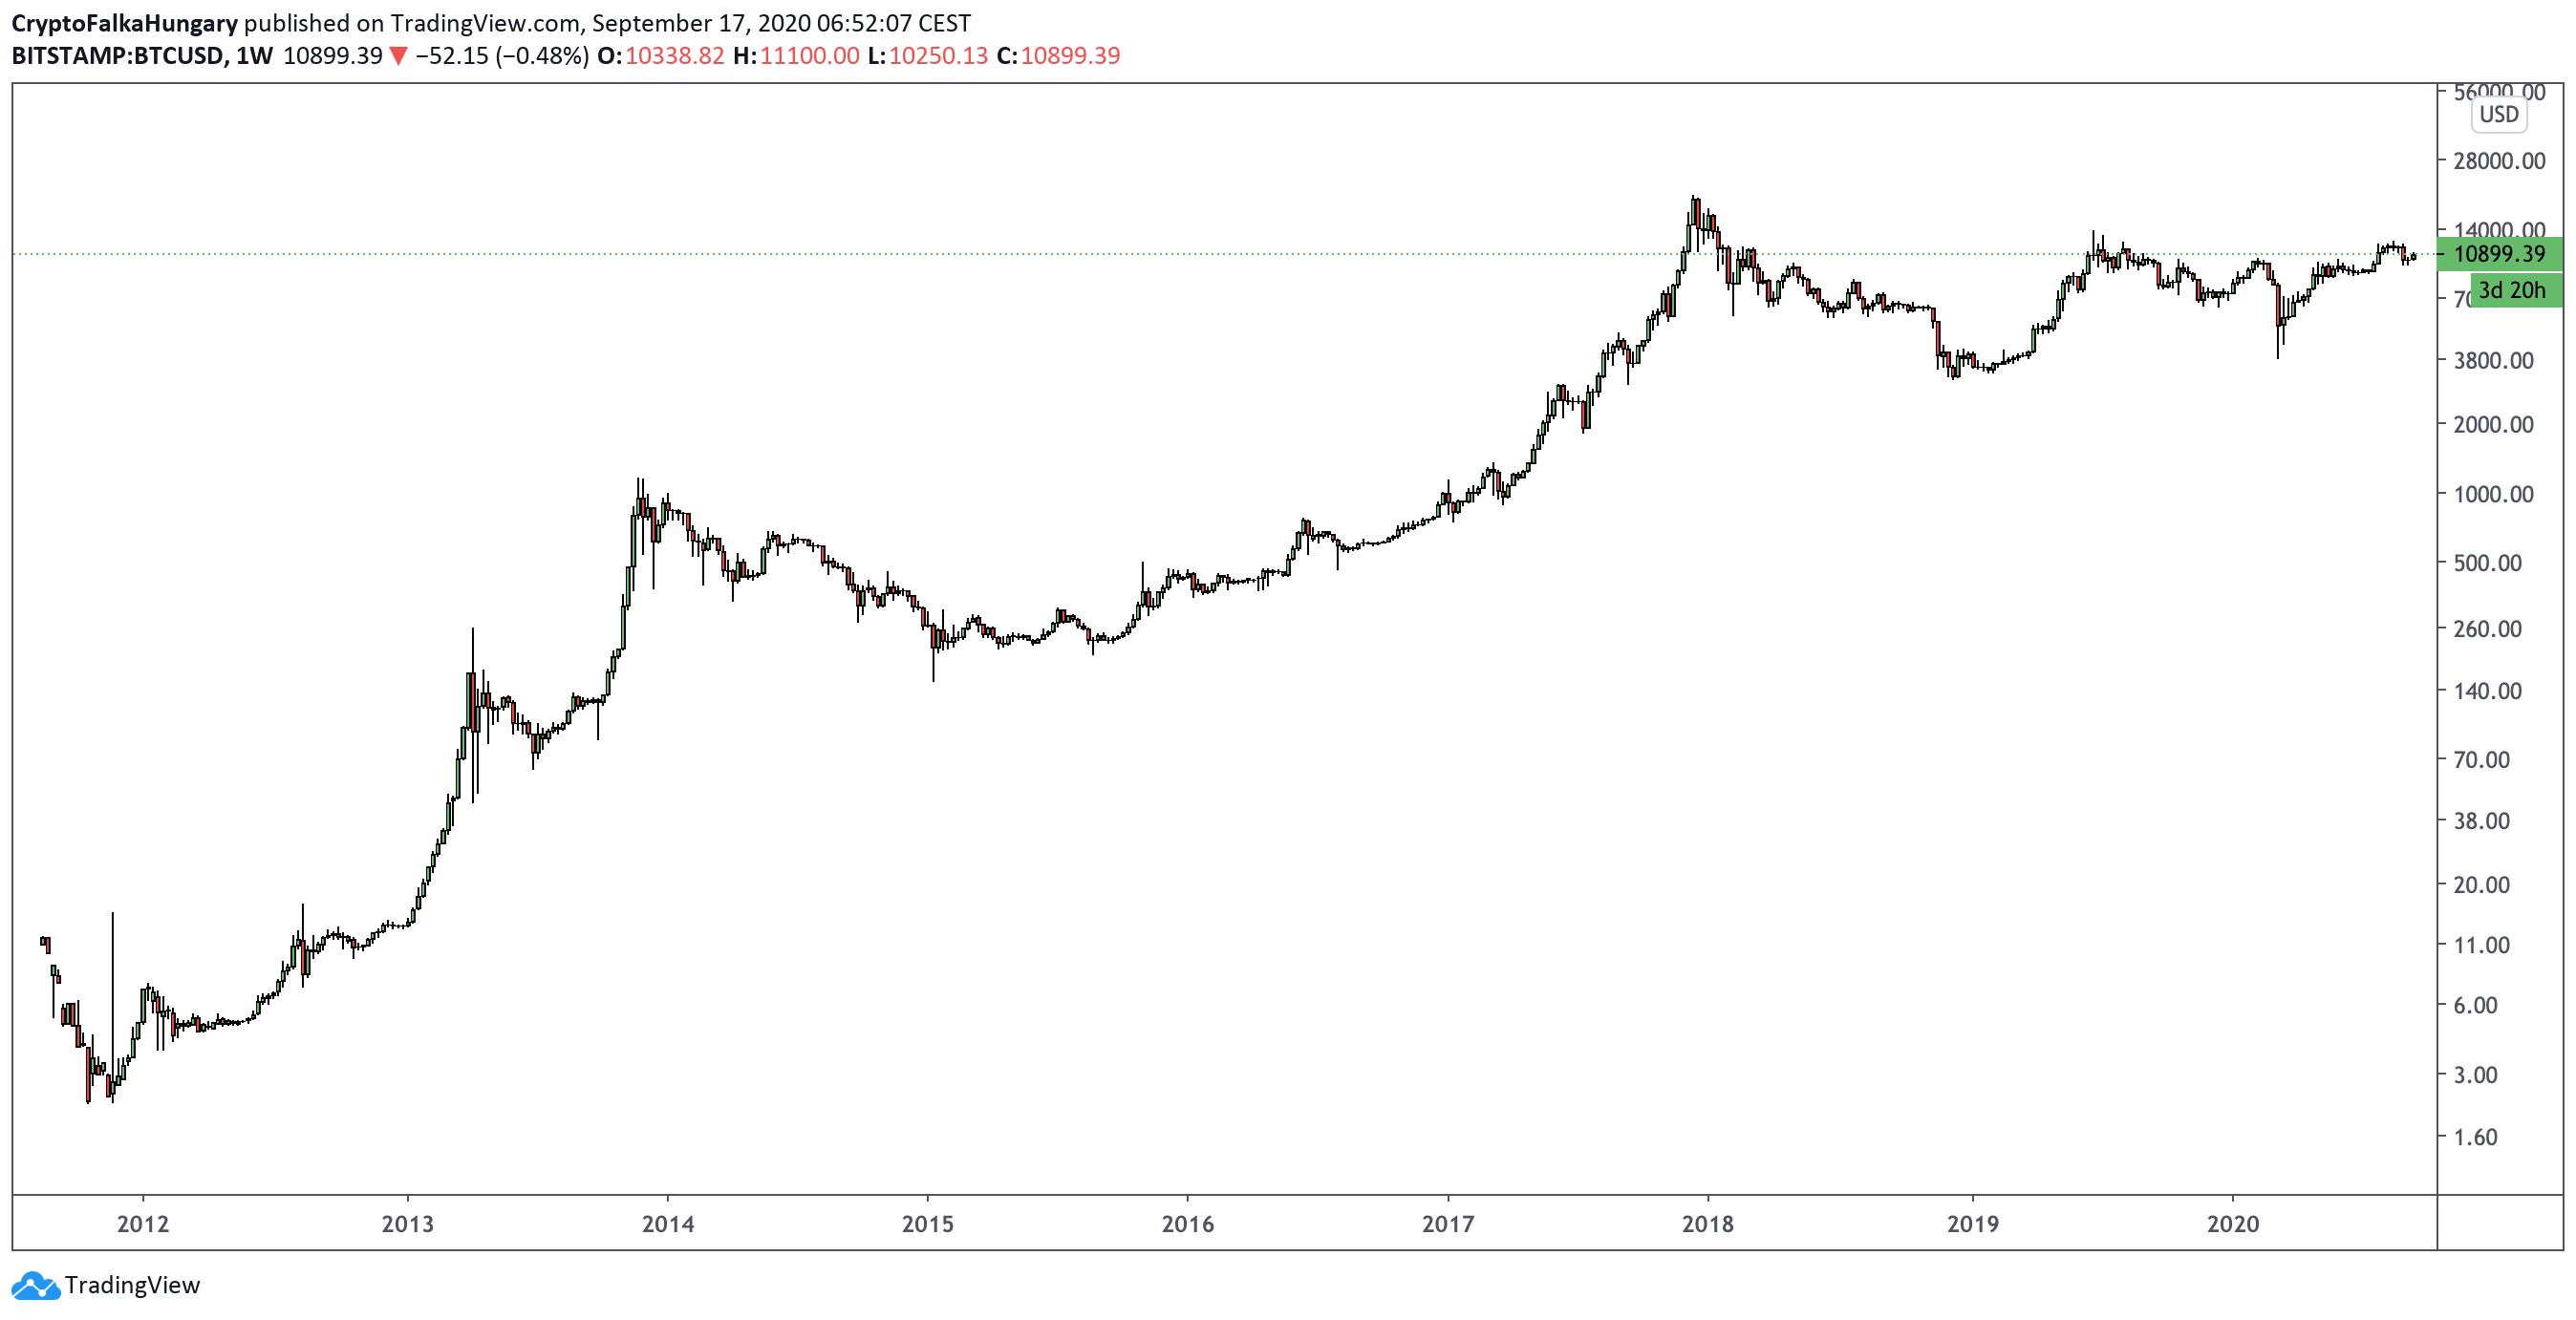 Bitcoin árfolyam grafikon 2012-2020 I Cryptofalka